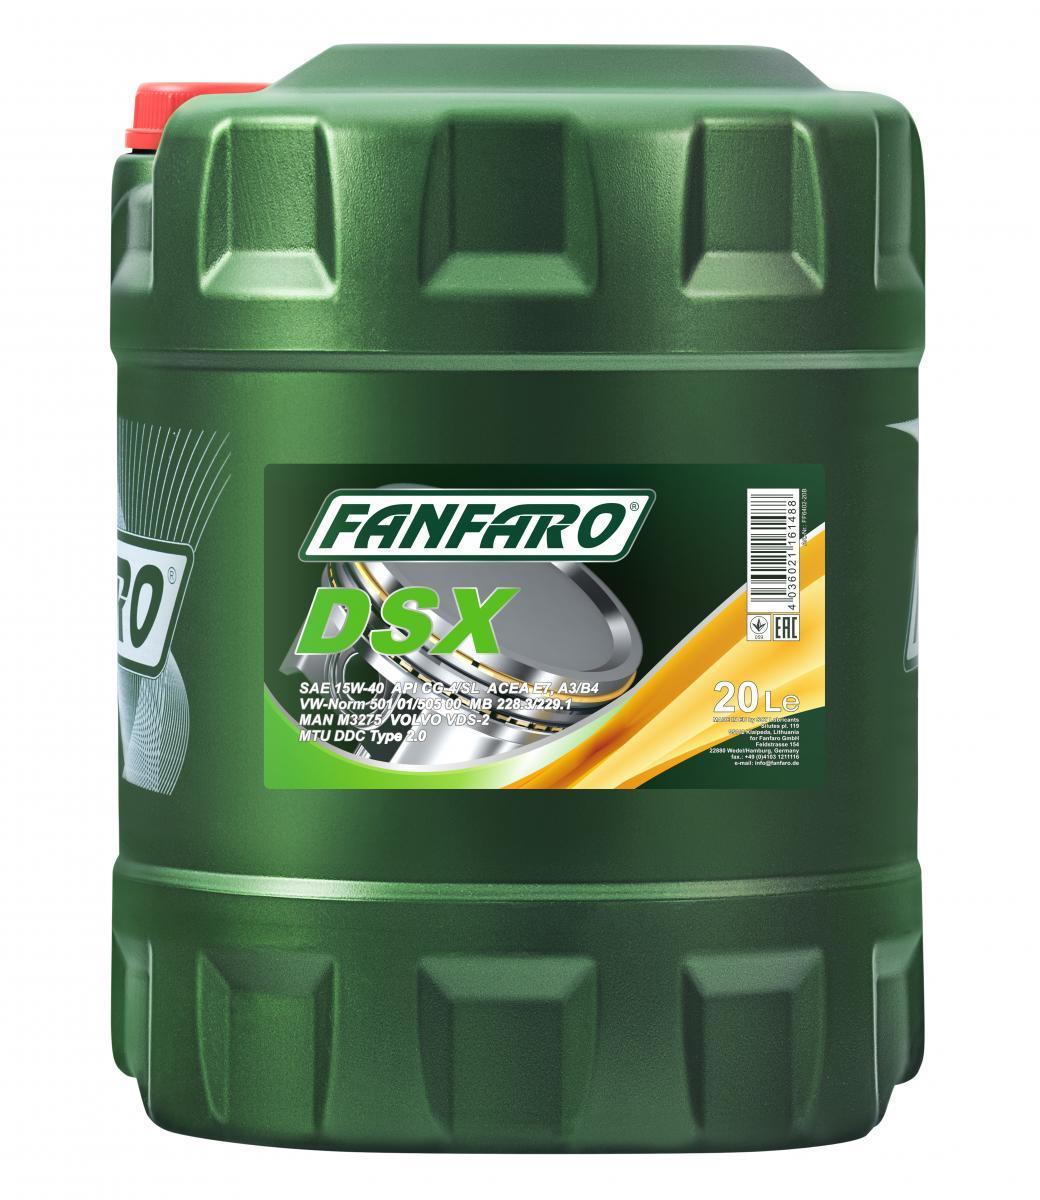 FF6402-20 FANFARO Master Line, DSX 15W-40, 20l, Mineralöl Motoröl FF6402-20 günstig kaufen